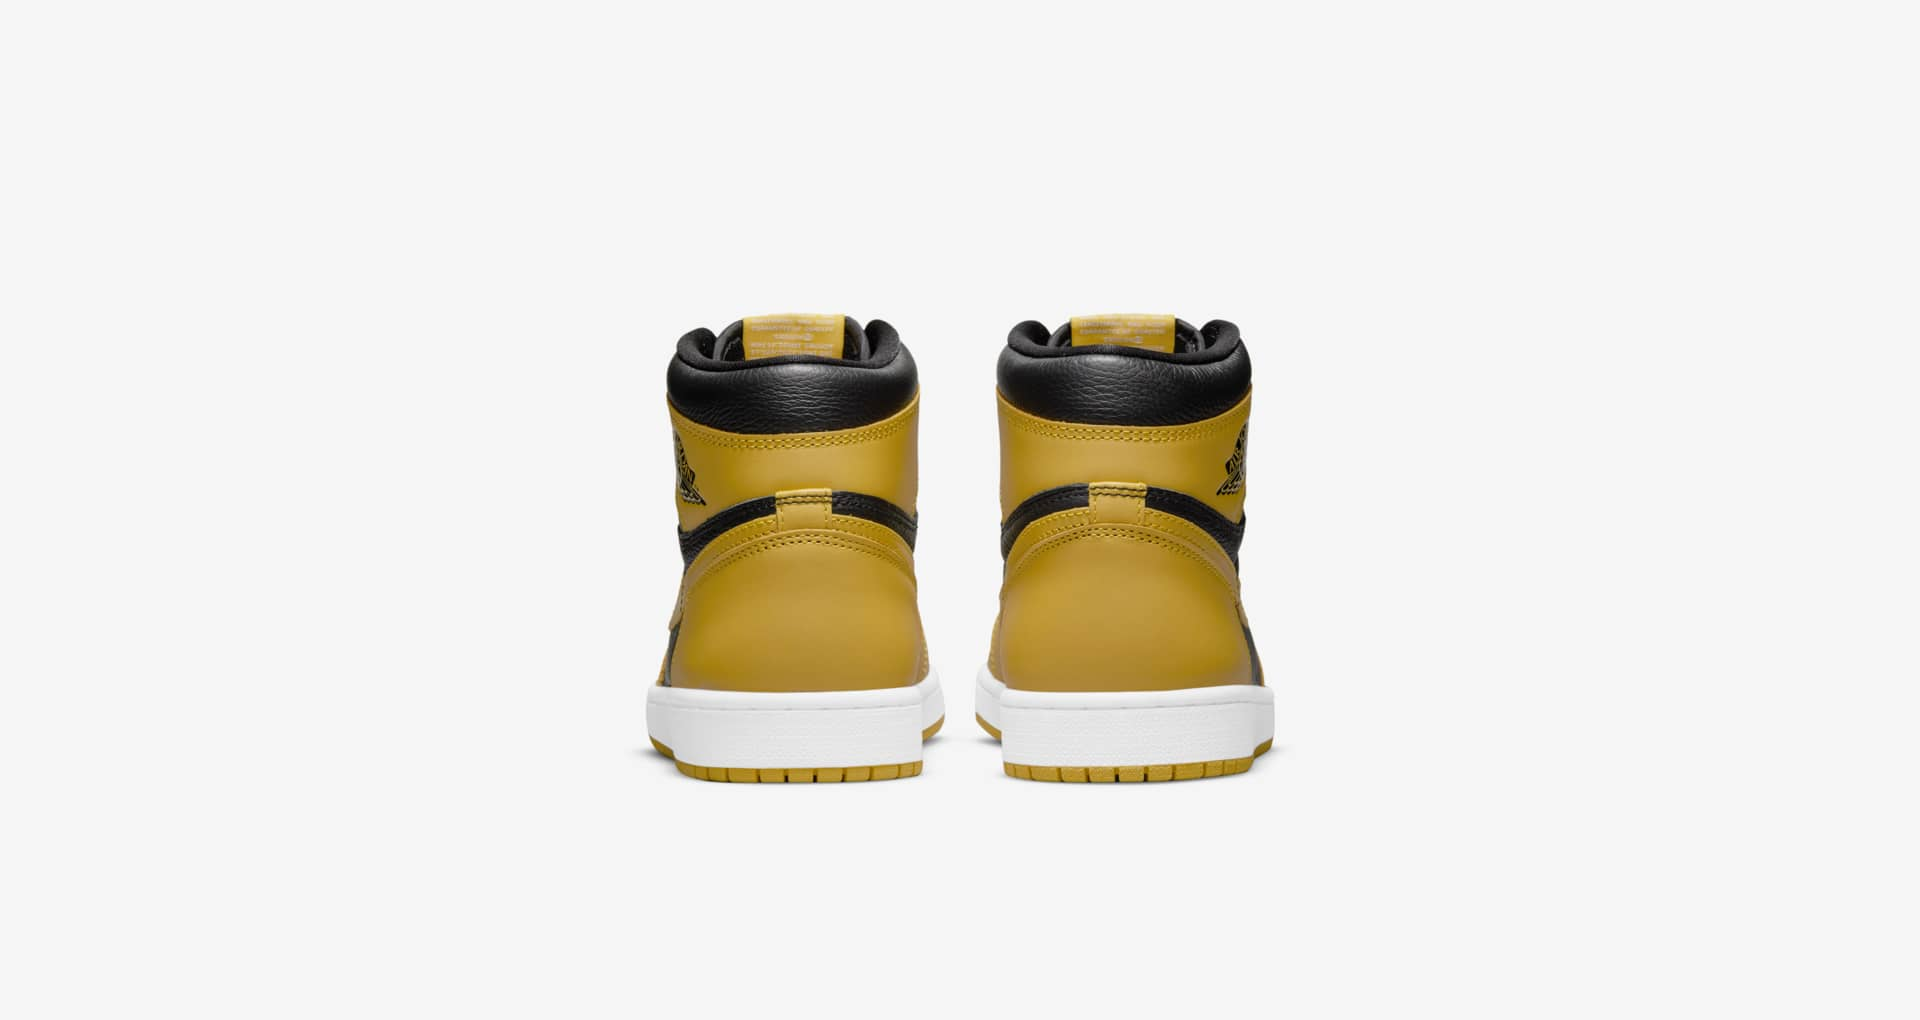 555088-701,Pollen,AJ1,Air Jord  SNKRS 预告上架!「武当」Air Jordan 1 你见过吗?